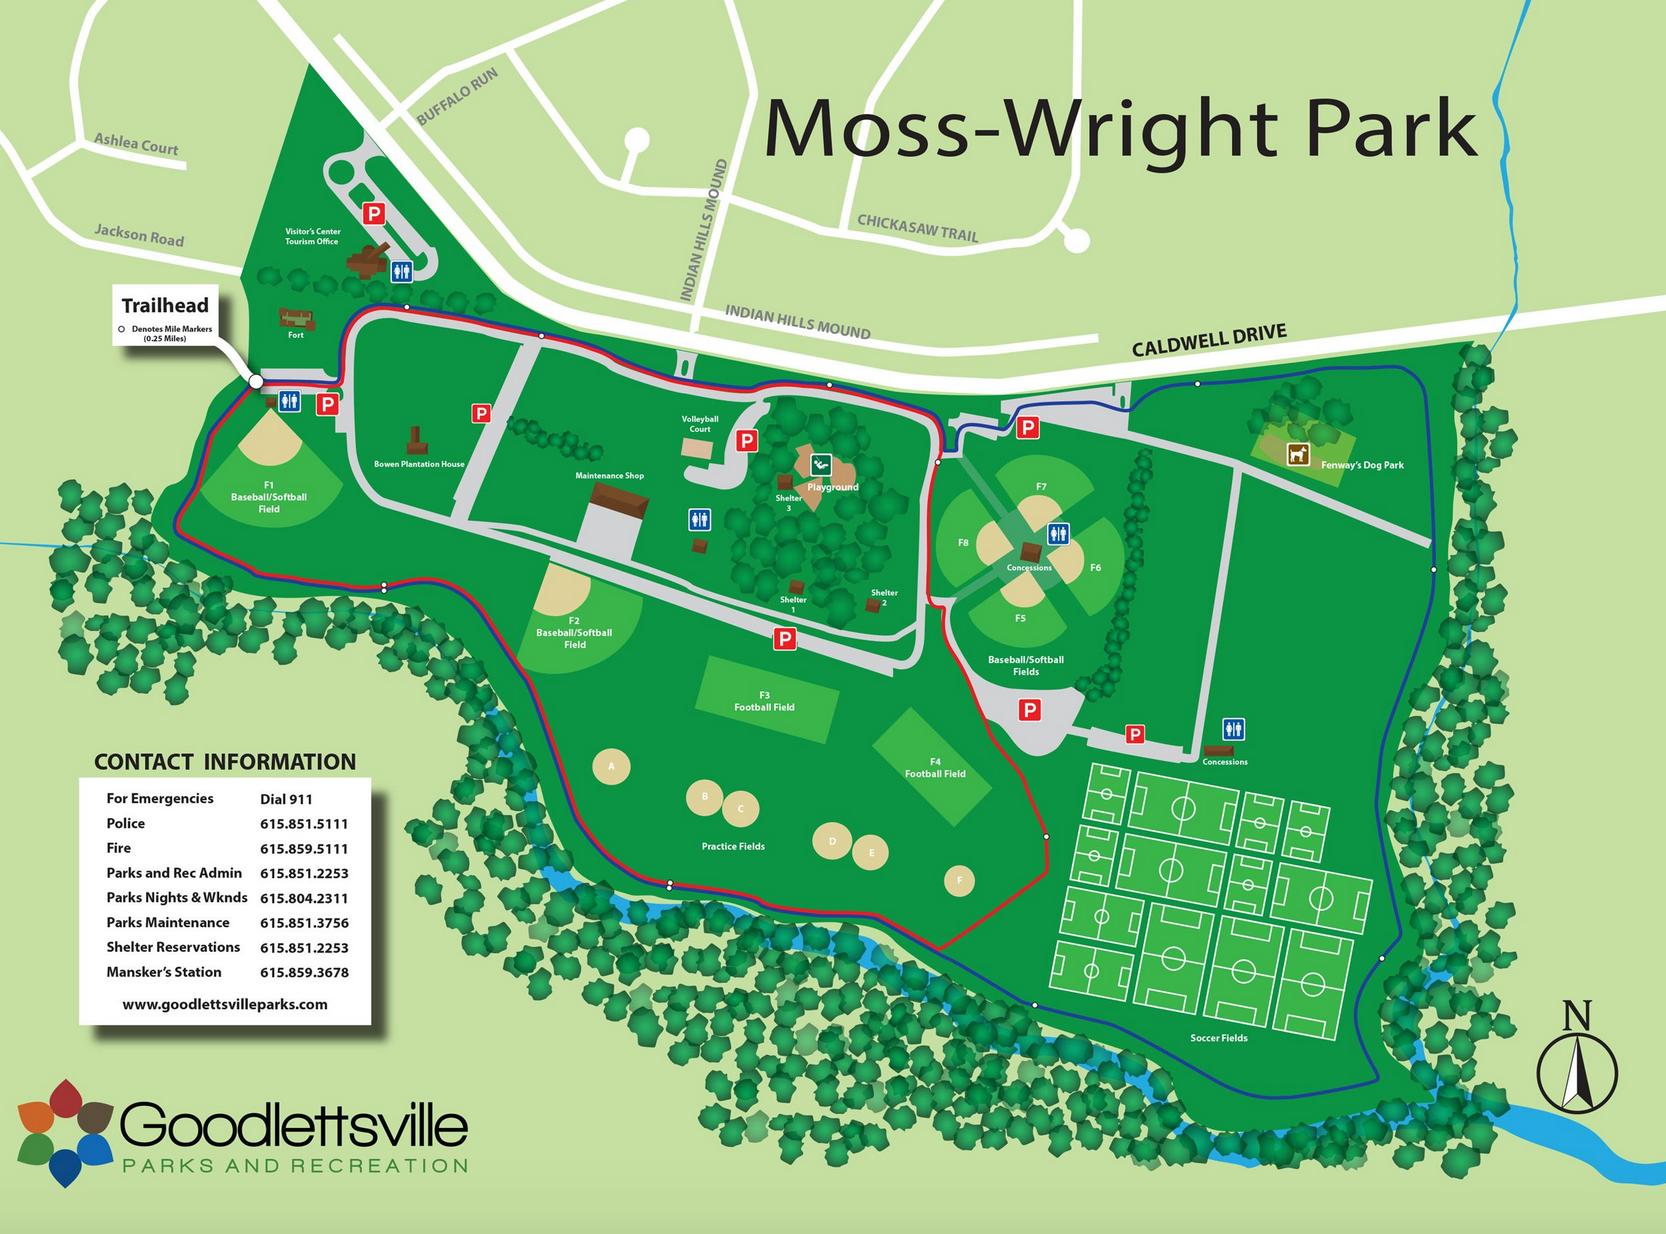 moss-wrightpark map